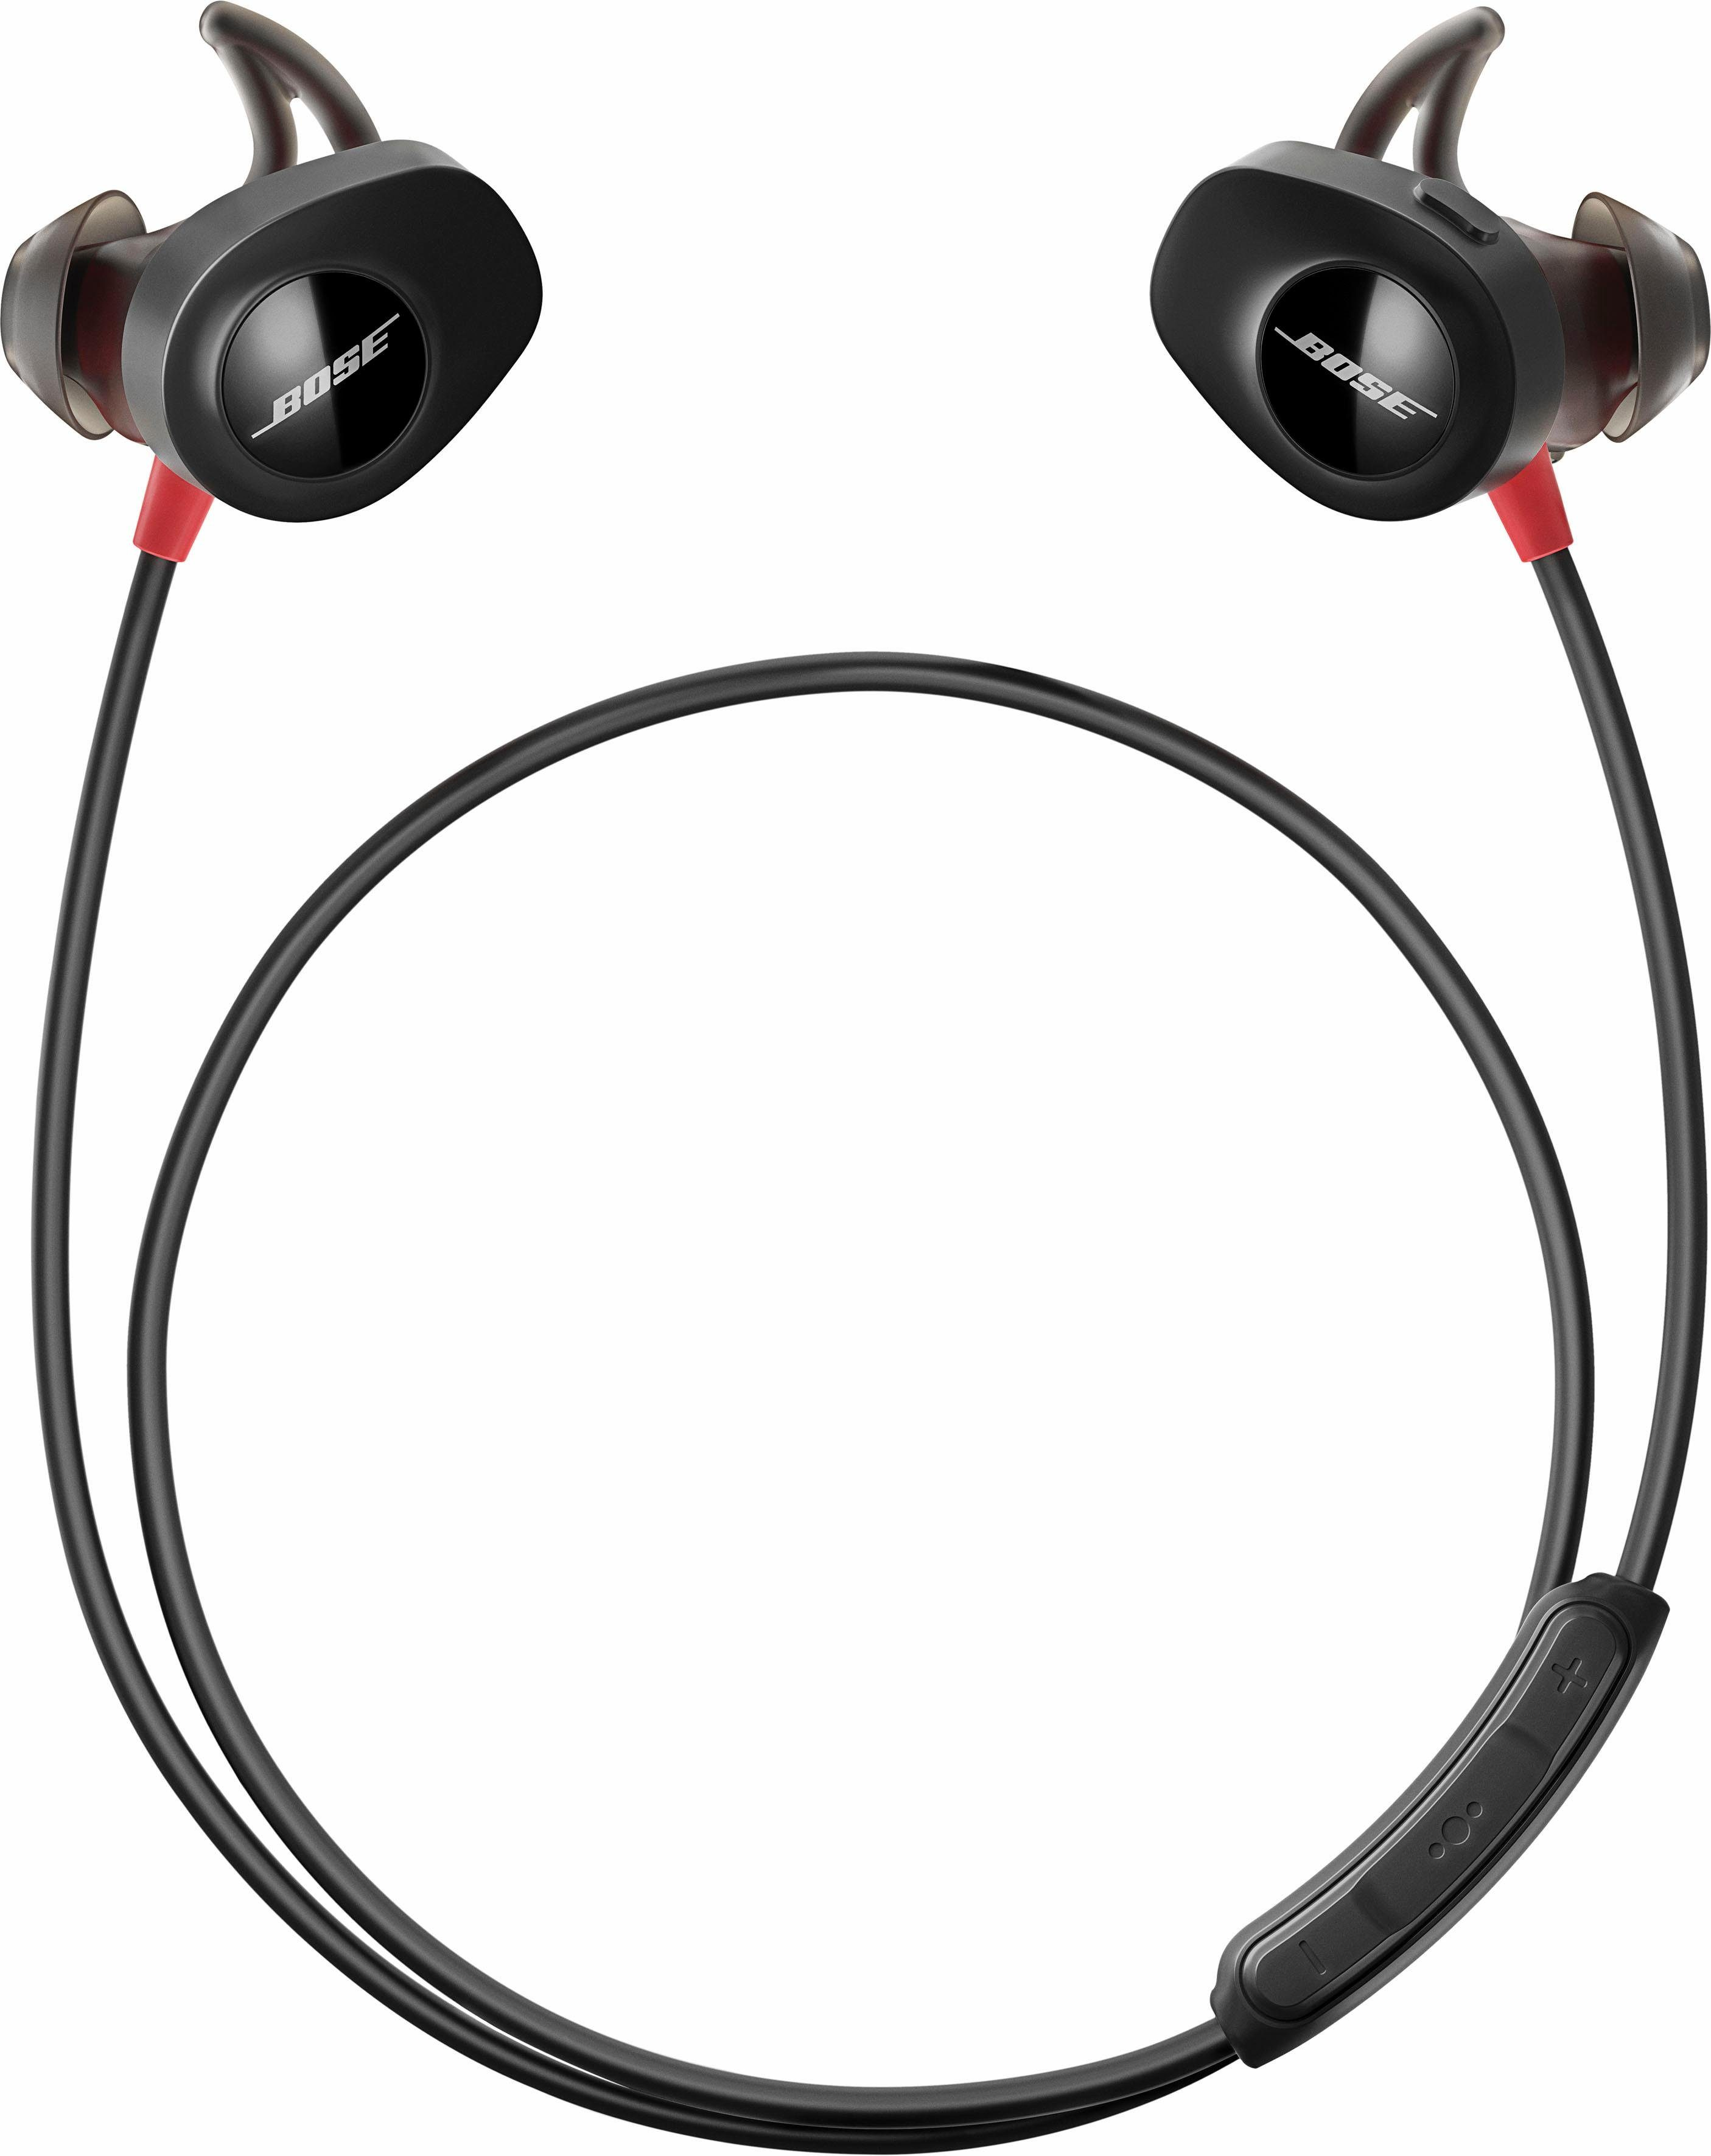 Bose SoundSport-Pulse In-Ear-Kopfhörer